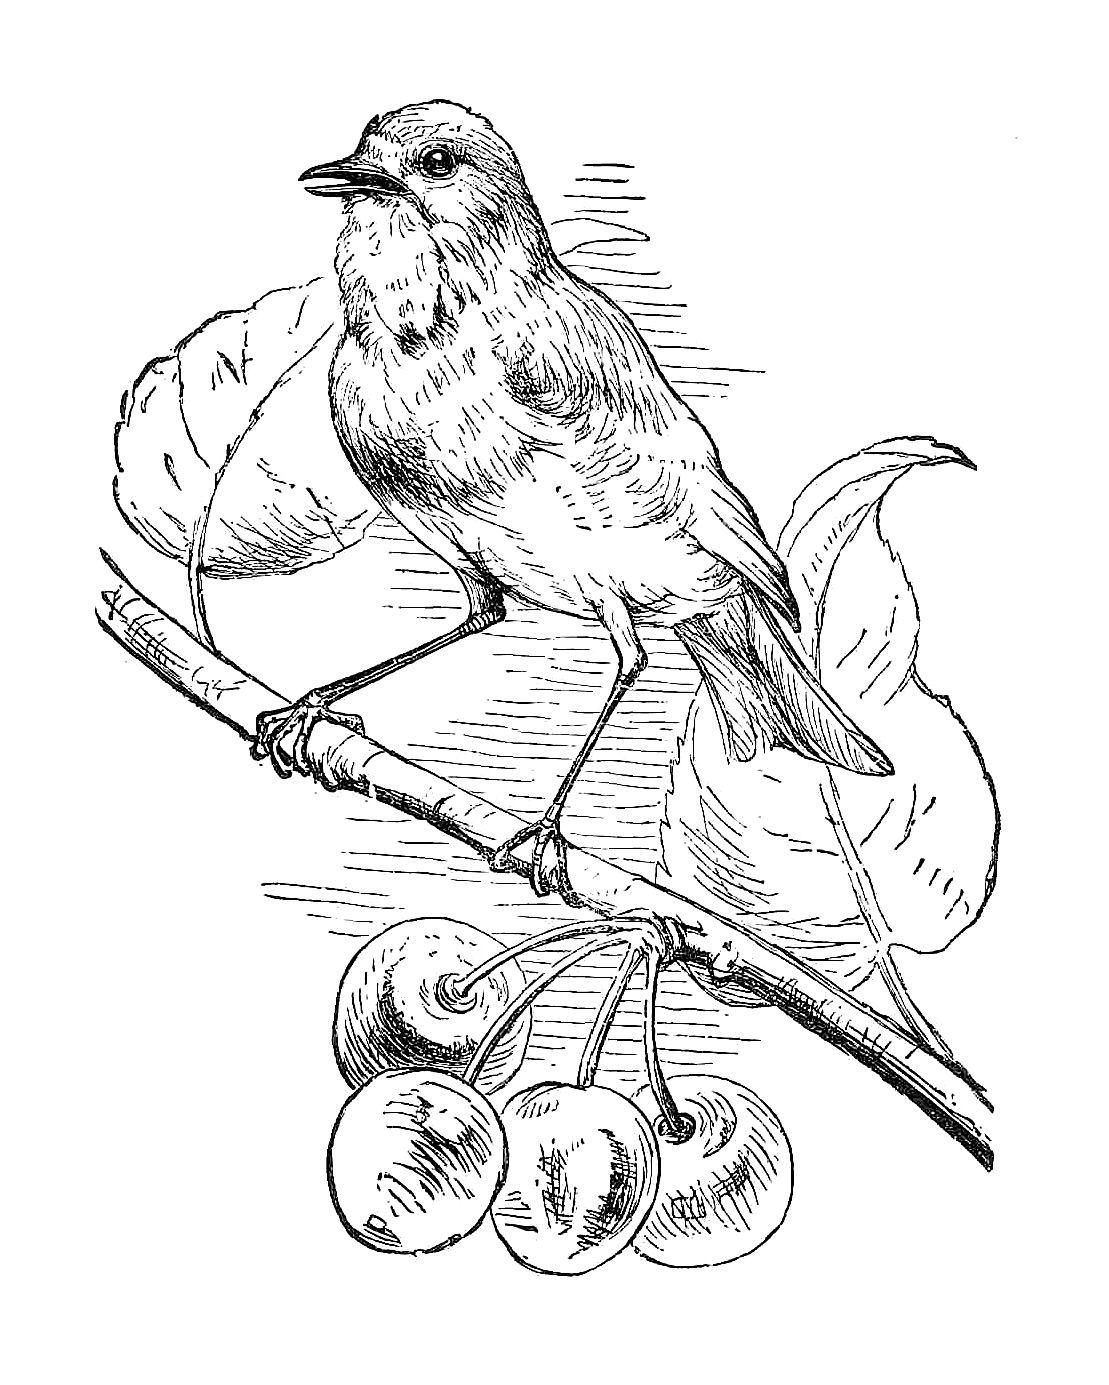 Antique Images Free Black And White Illustration Bird